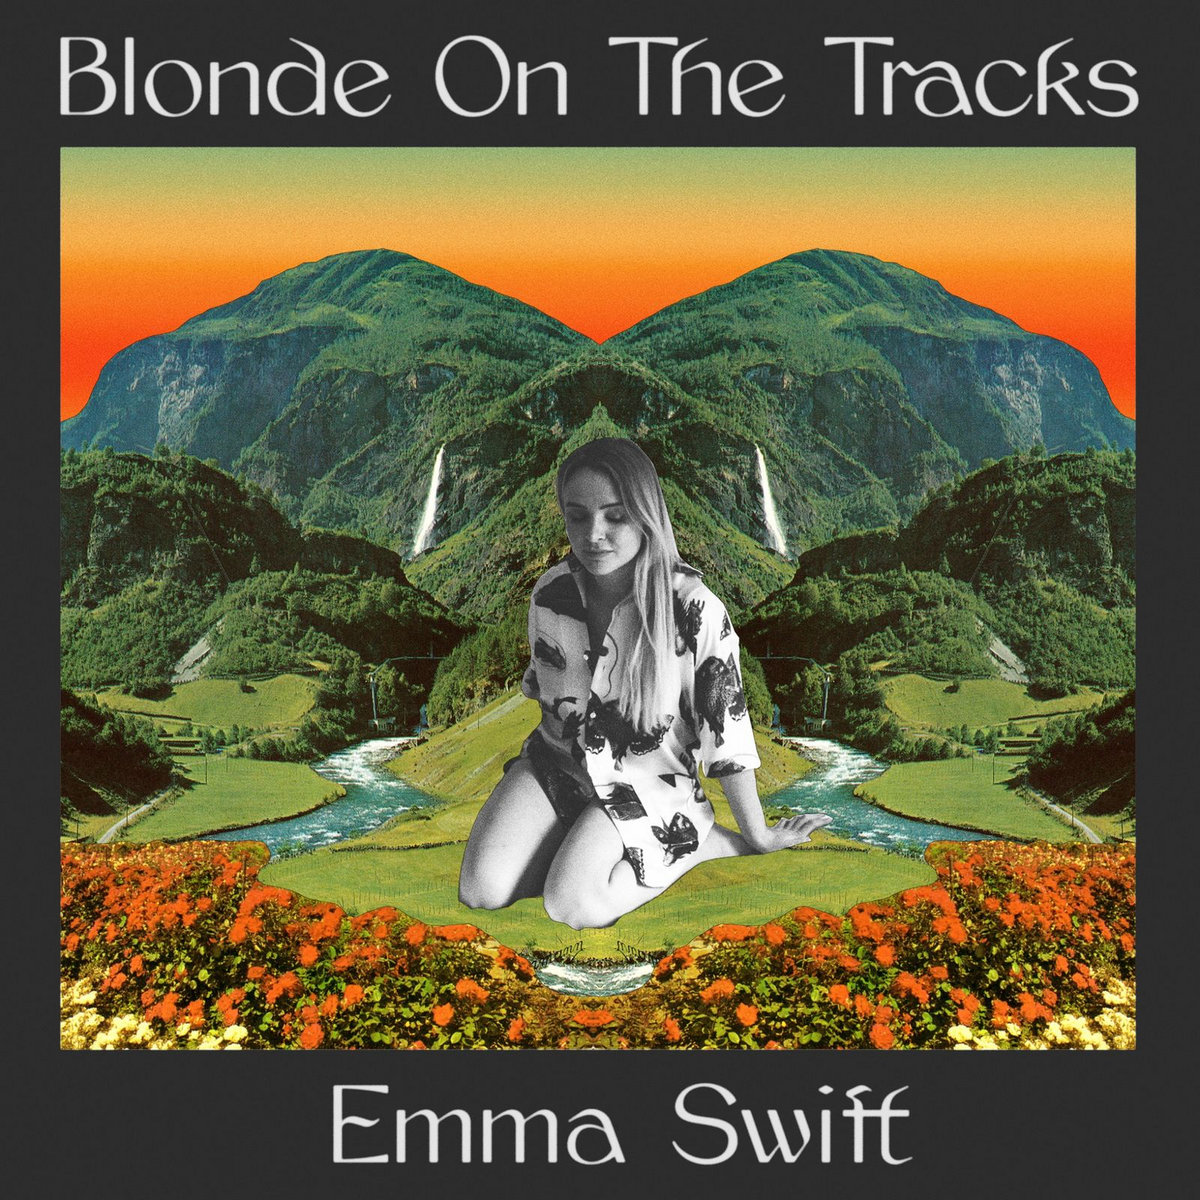 Blonde On The Tracks | Emma Swift